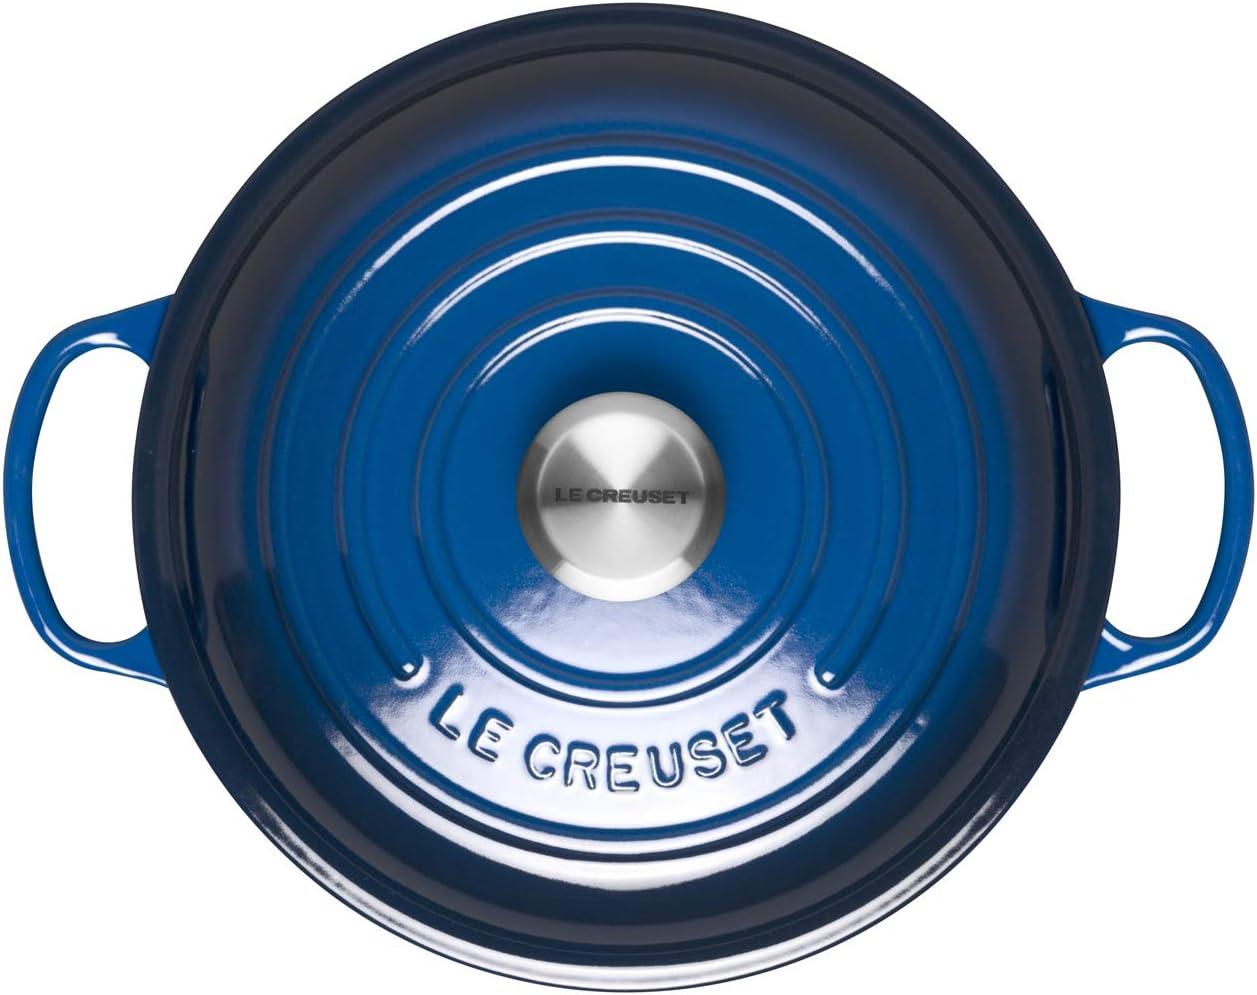 Include Induction LE CREUSET Signature Cast Iron ShAllow Casserole//Braiser Ideal for All Ovens and Ranges 2.2 Litre Lapis Diameter 26 cm Round